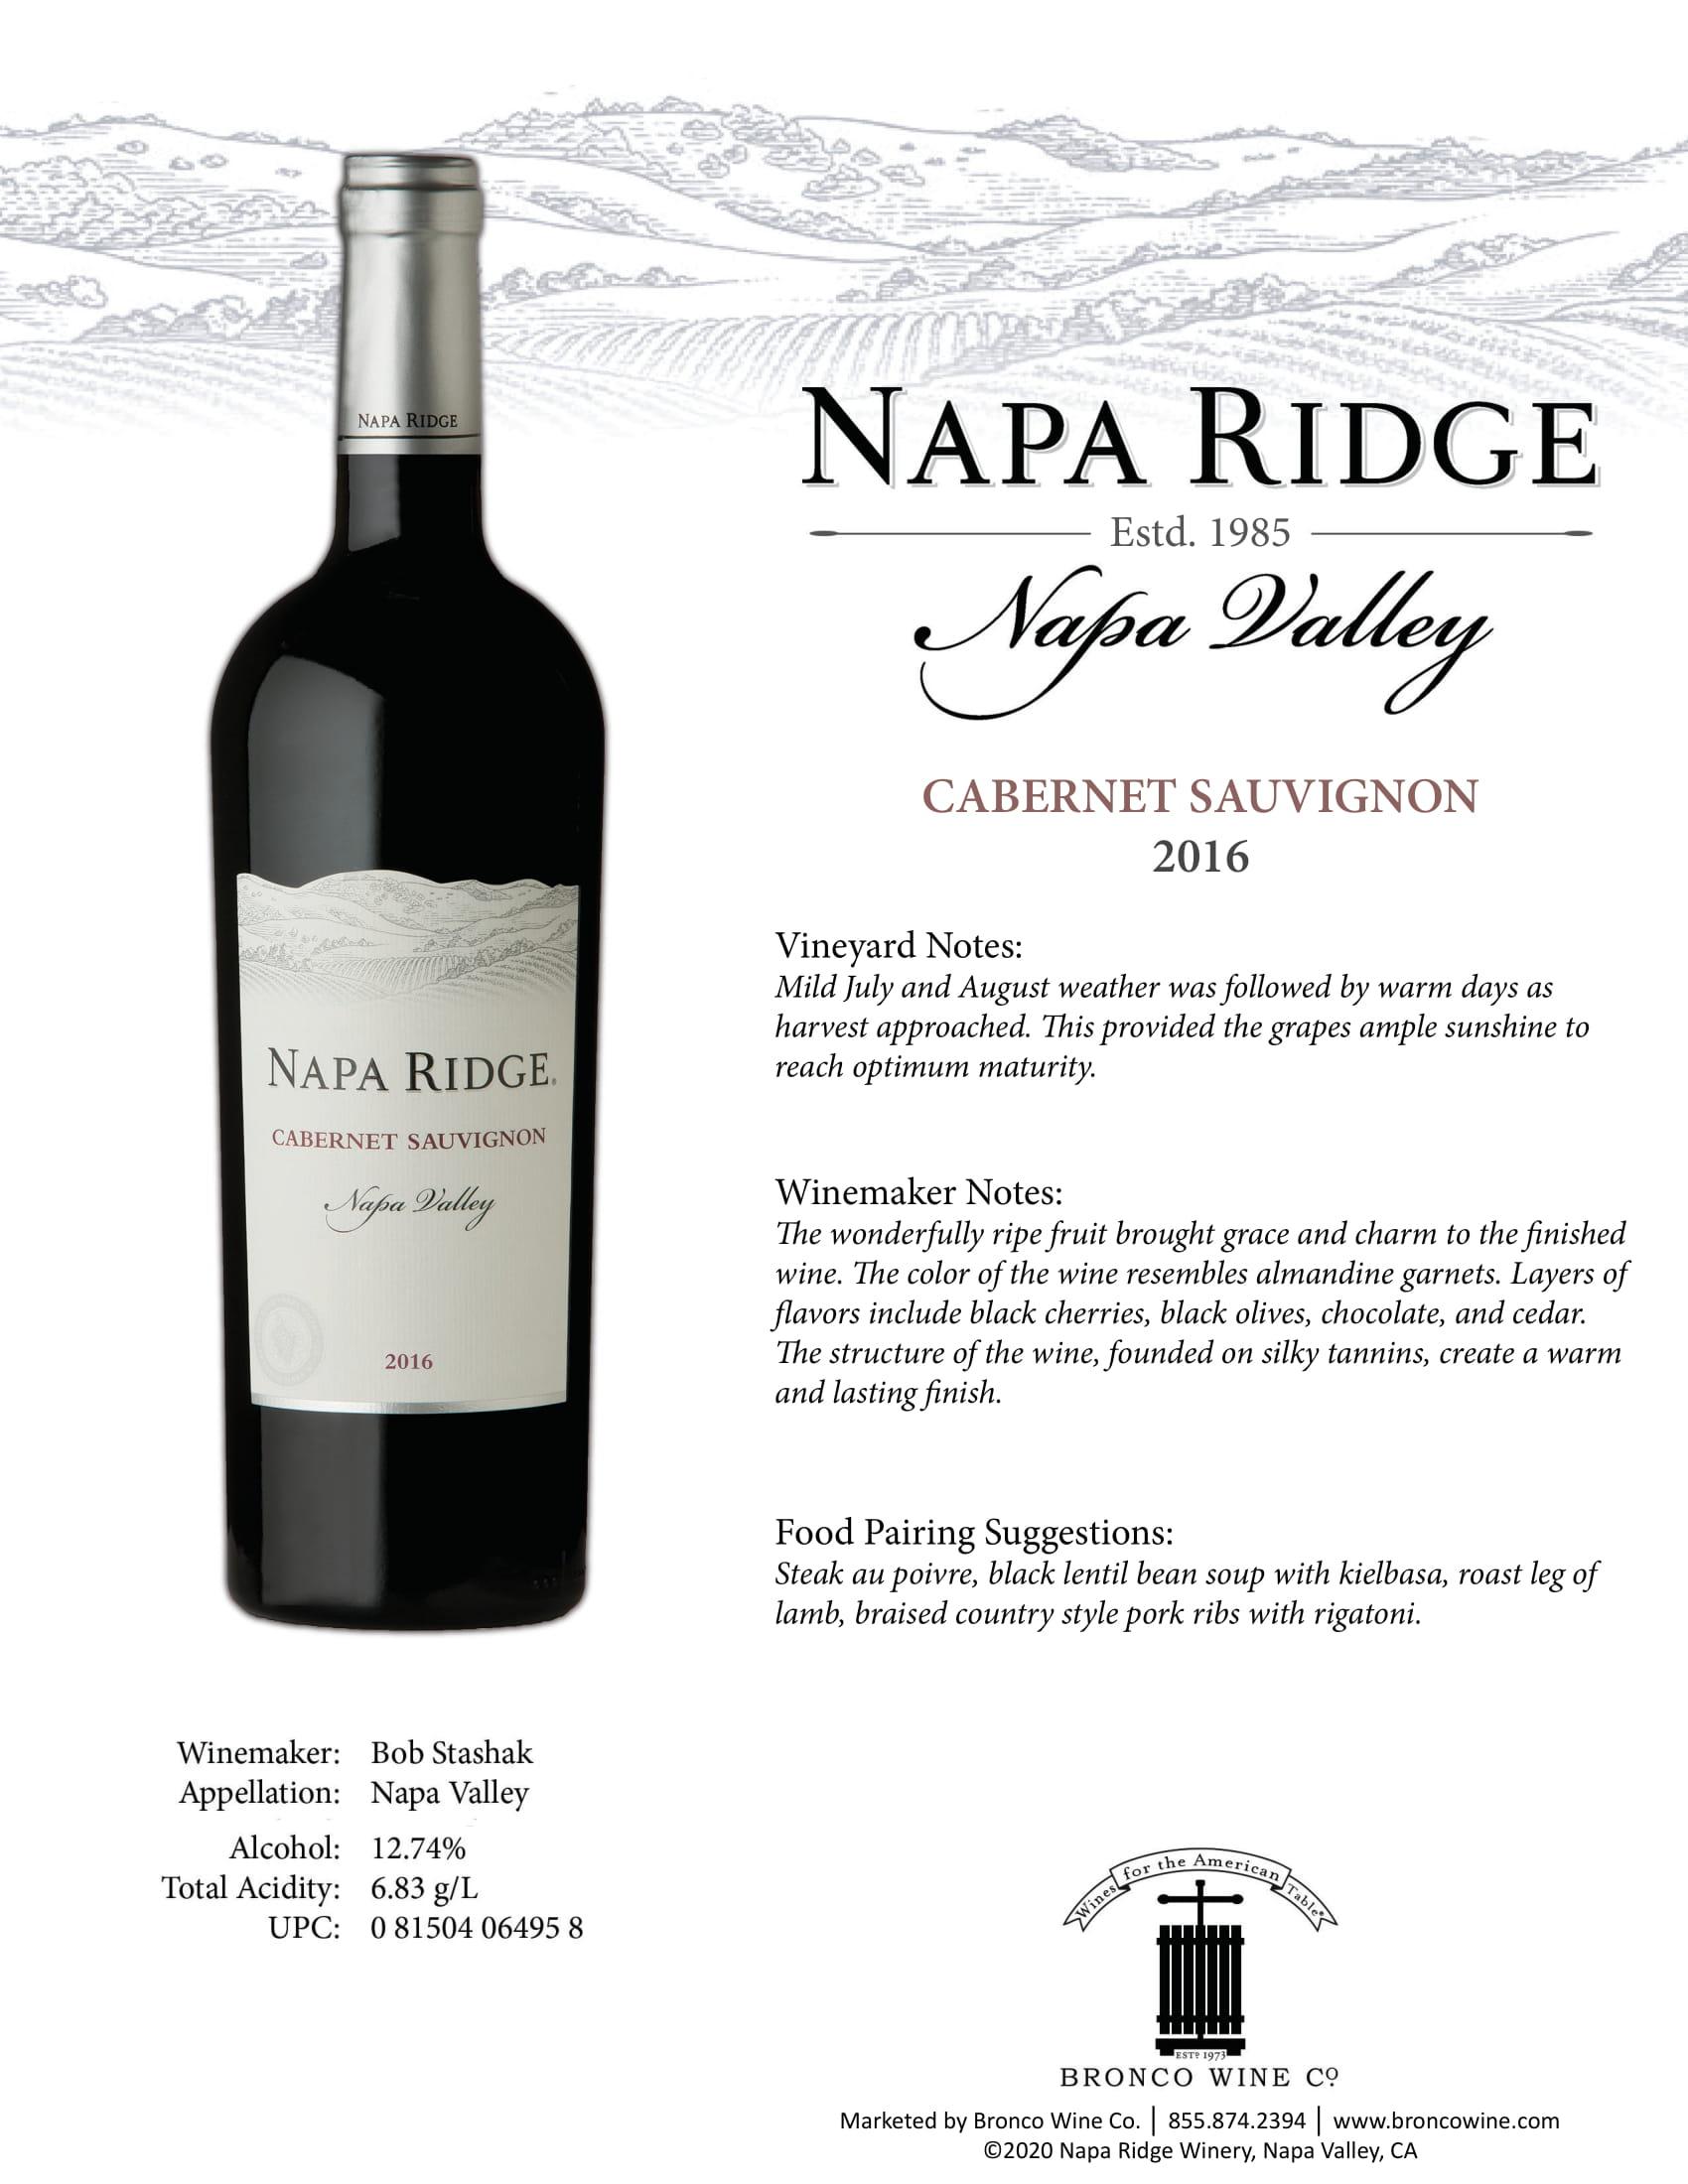 Napa Ridge Cabernet Sauvignon Tech Sheet